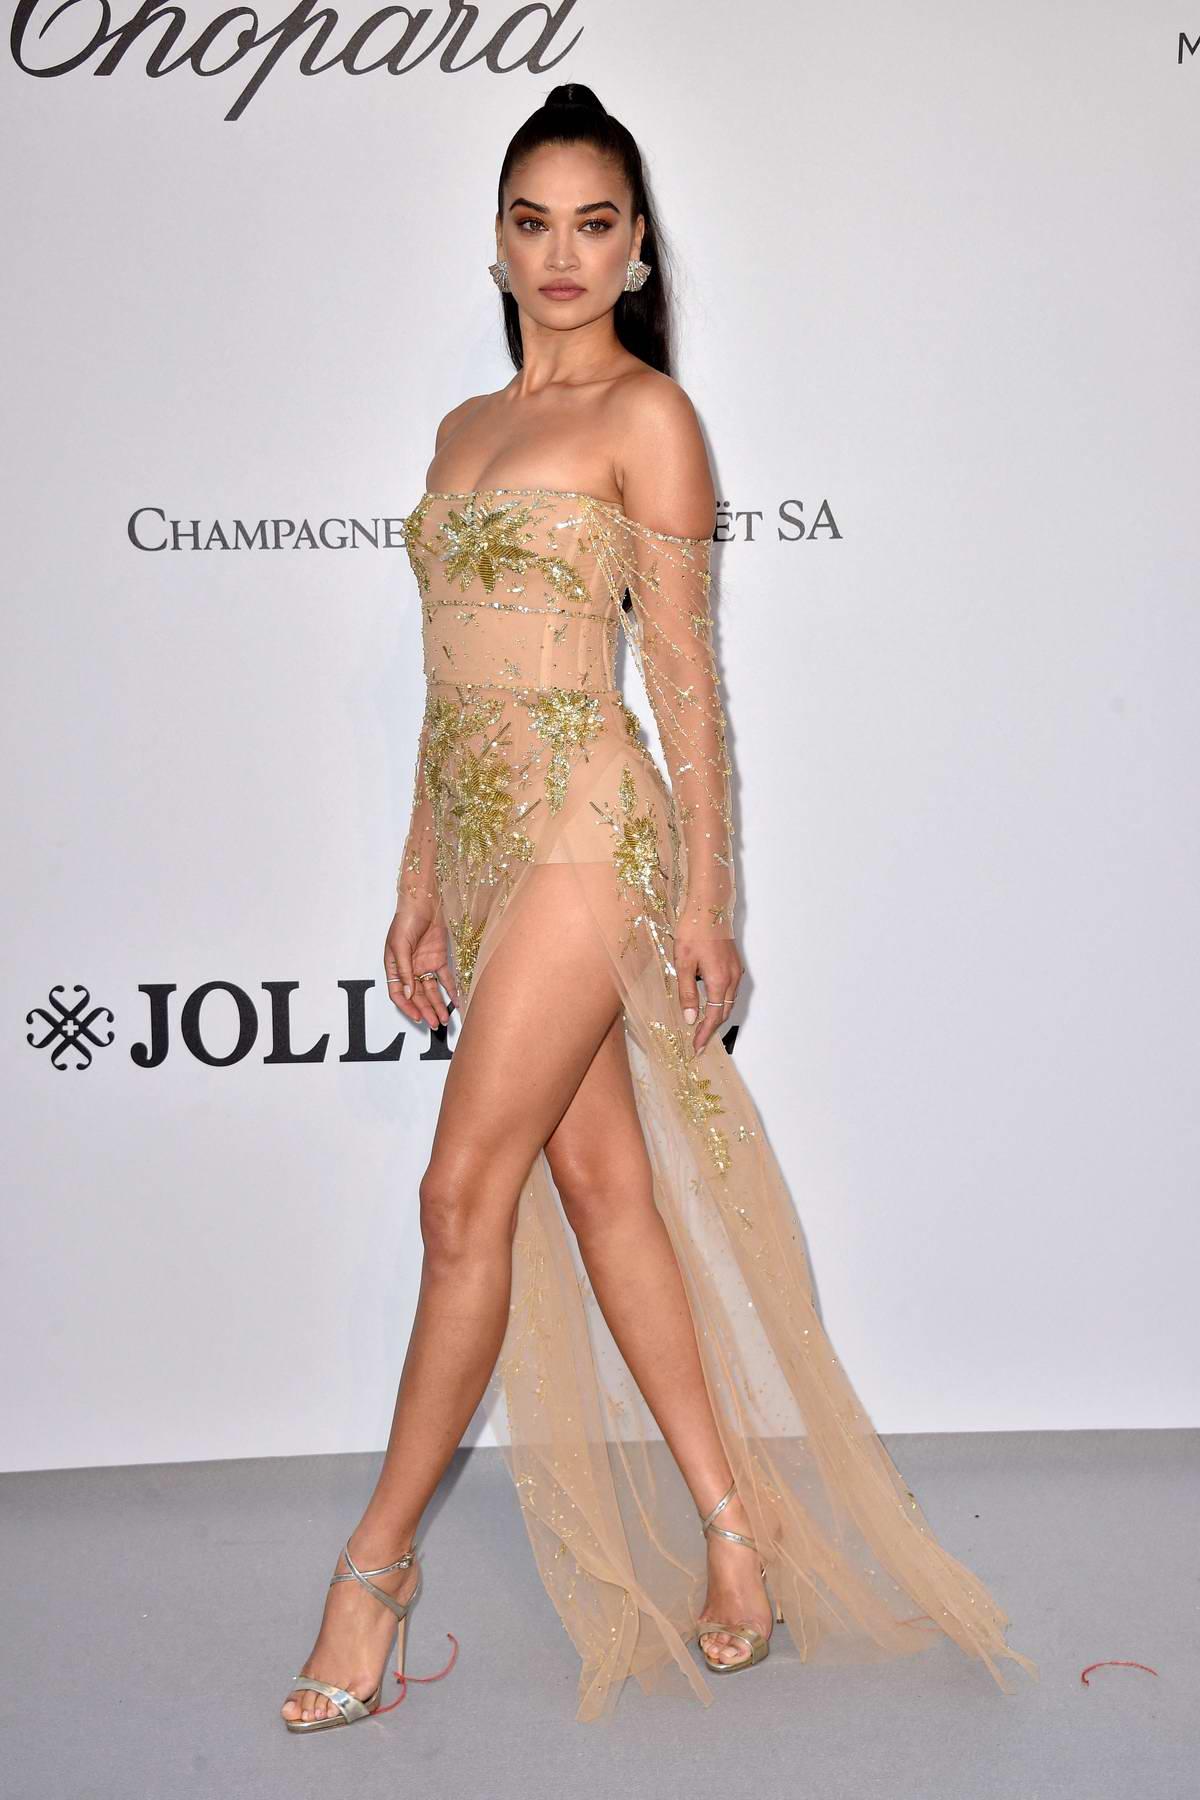 Shanina Shaik attends the 26th amfAR Gala held at Hotel du Cap-Eden-Roc during the